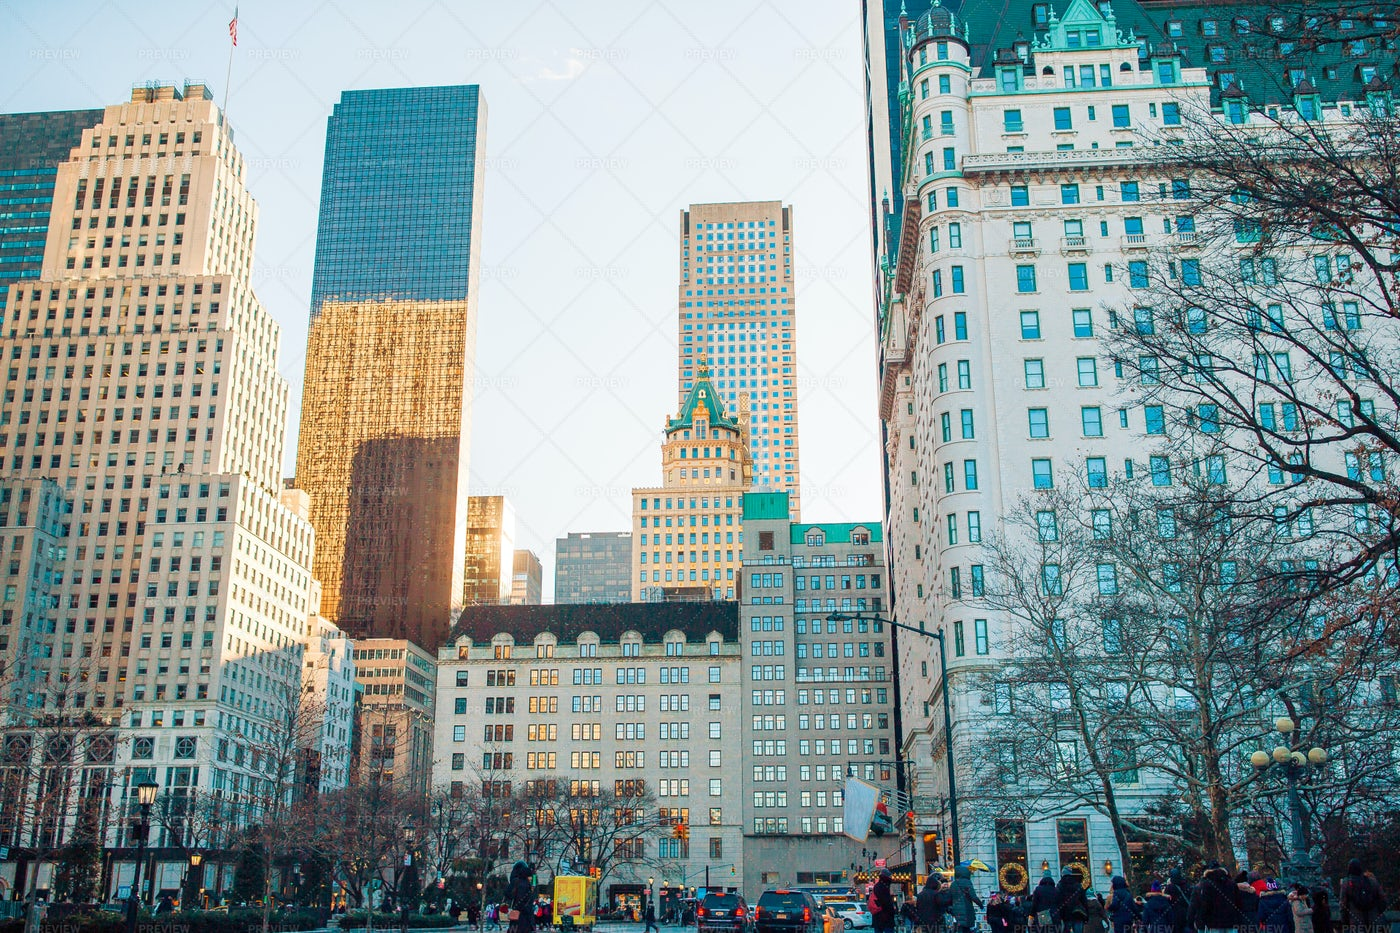 Streets Of New York City: Stock Photos